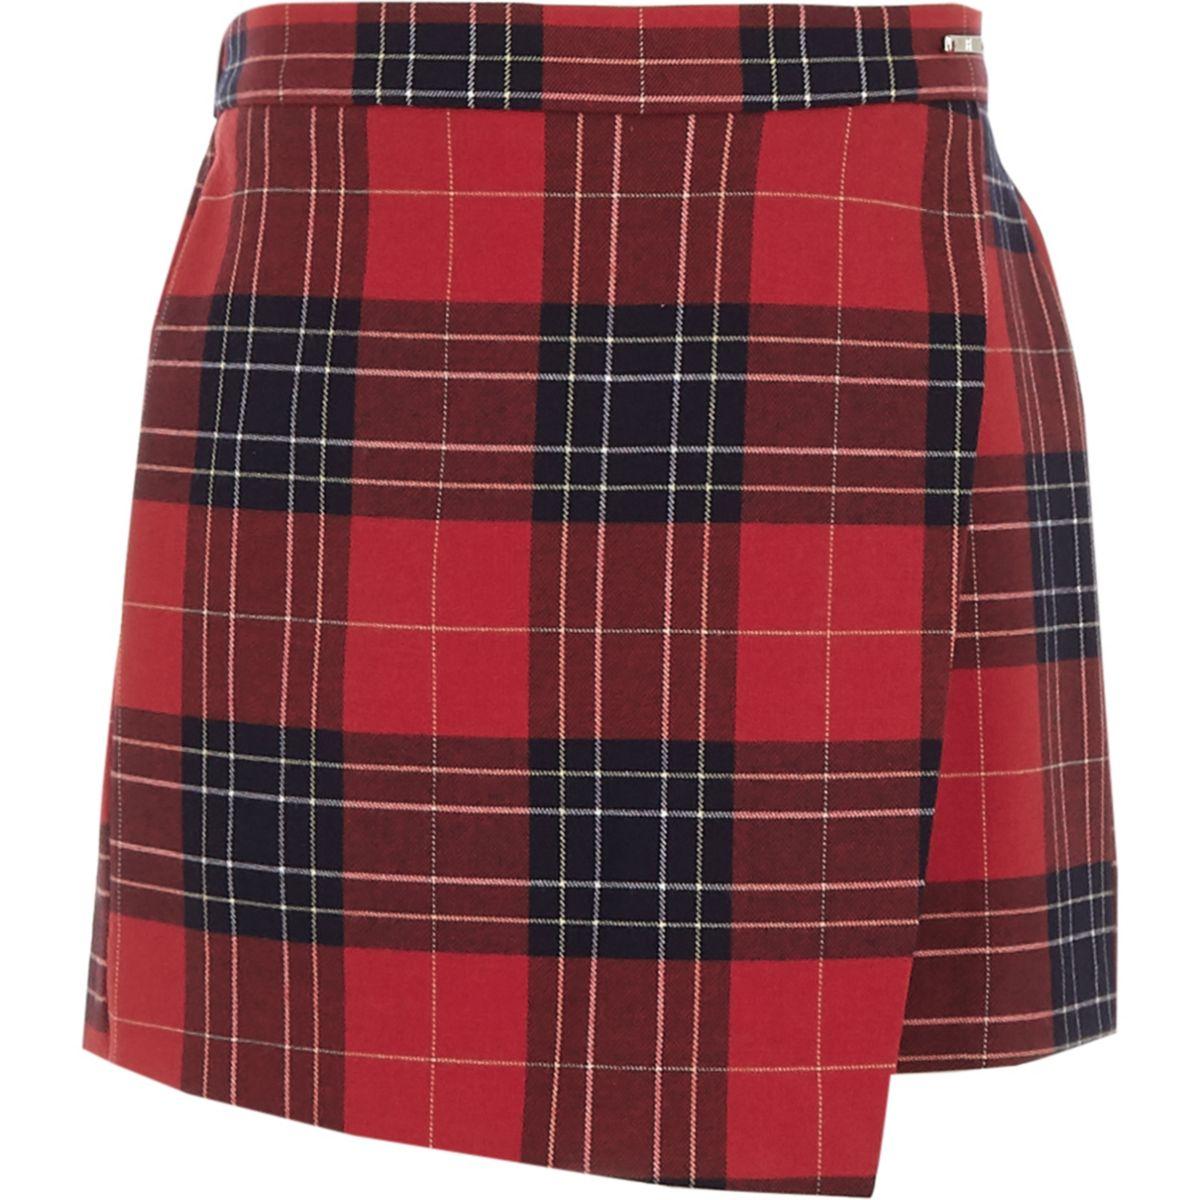 Girls red plaid skirt